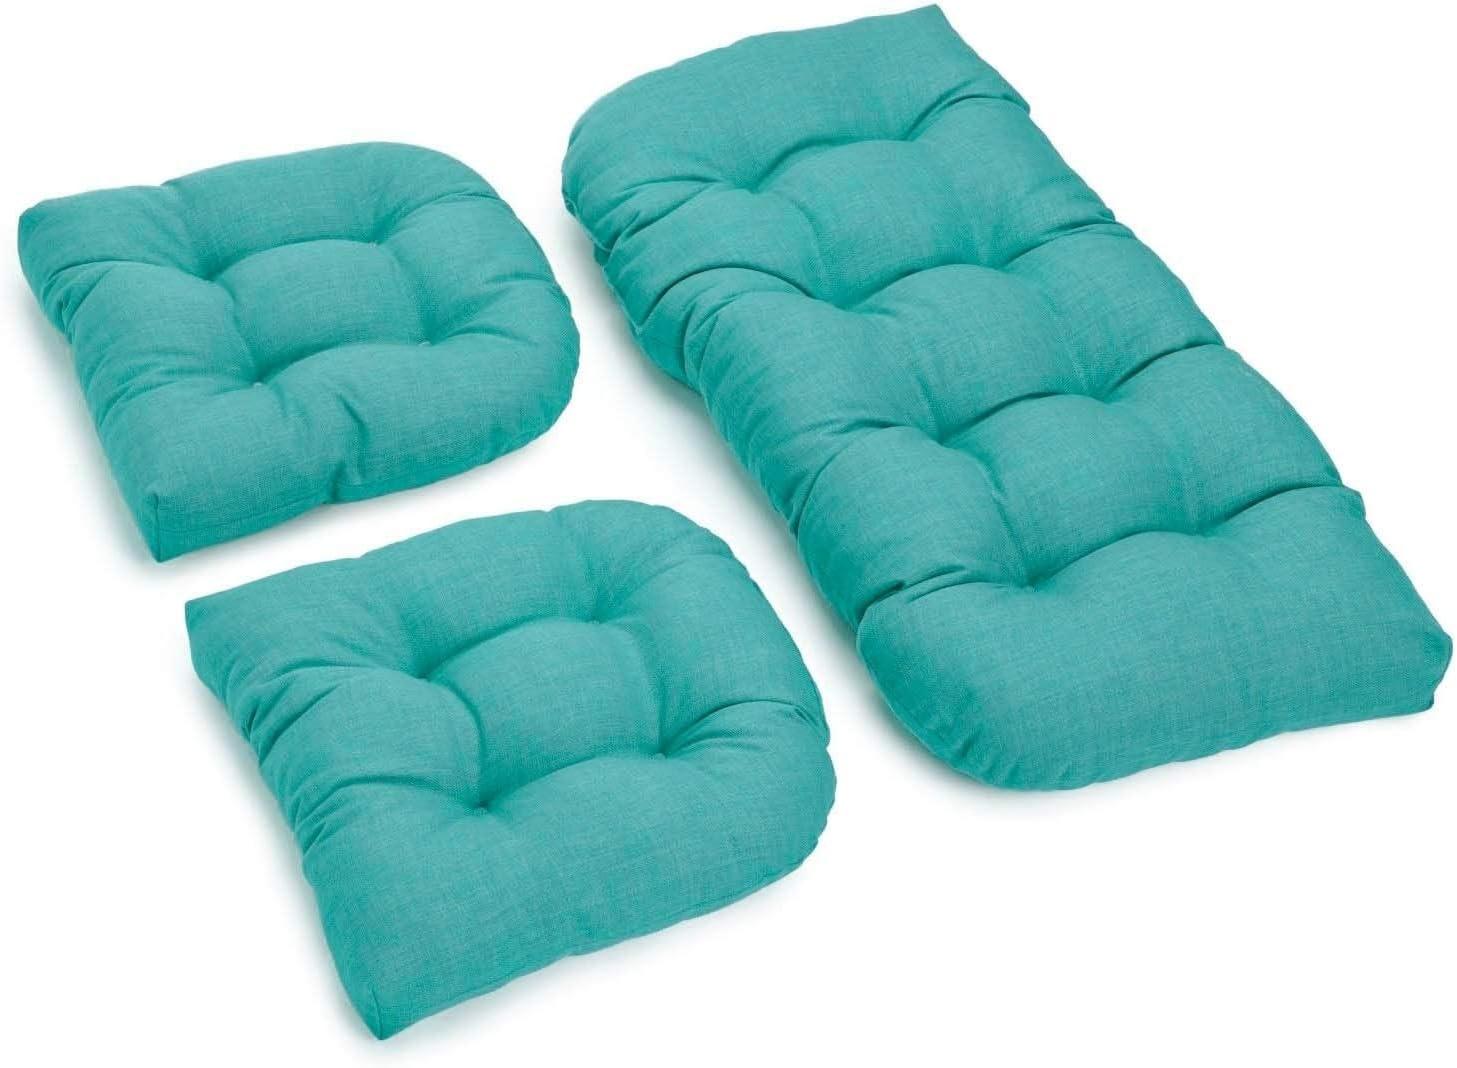 Blazing Needles All-Weather Bench Cushion Set Set of 3 Aqua Blue